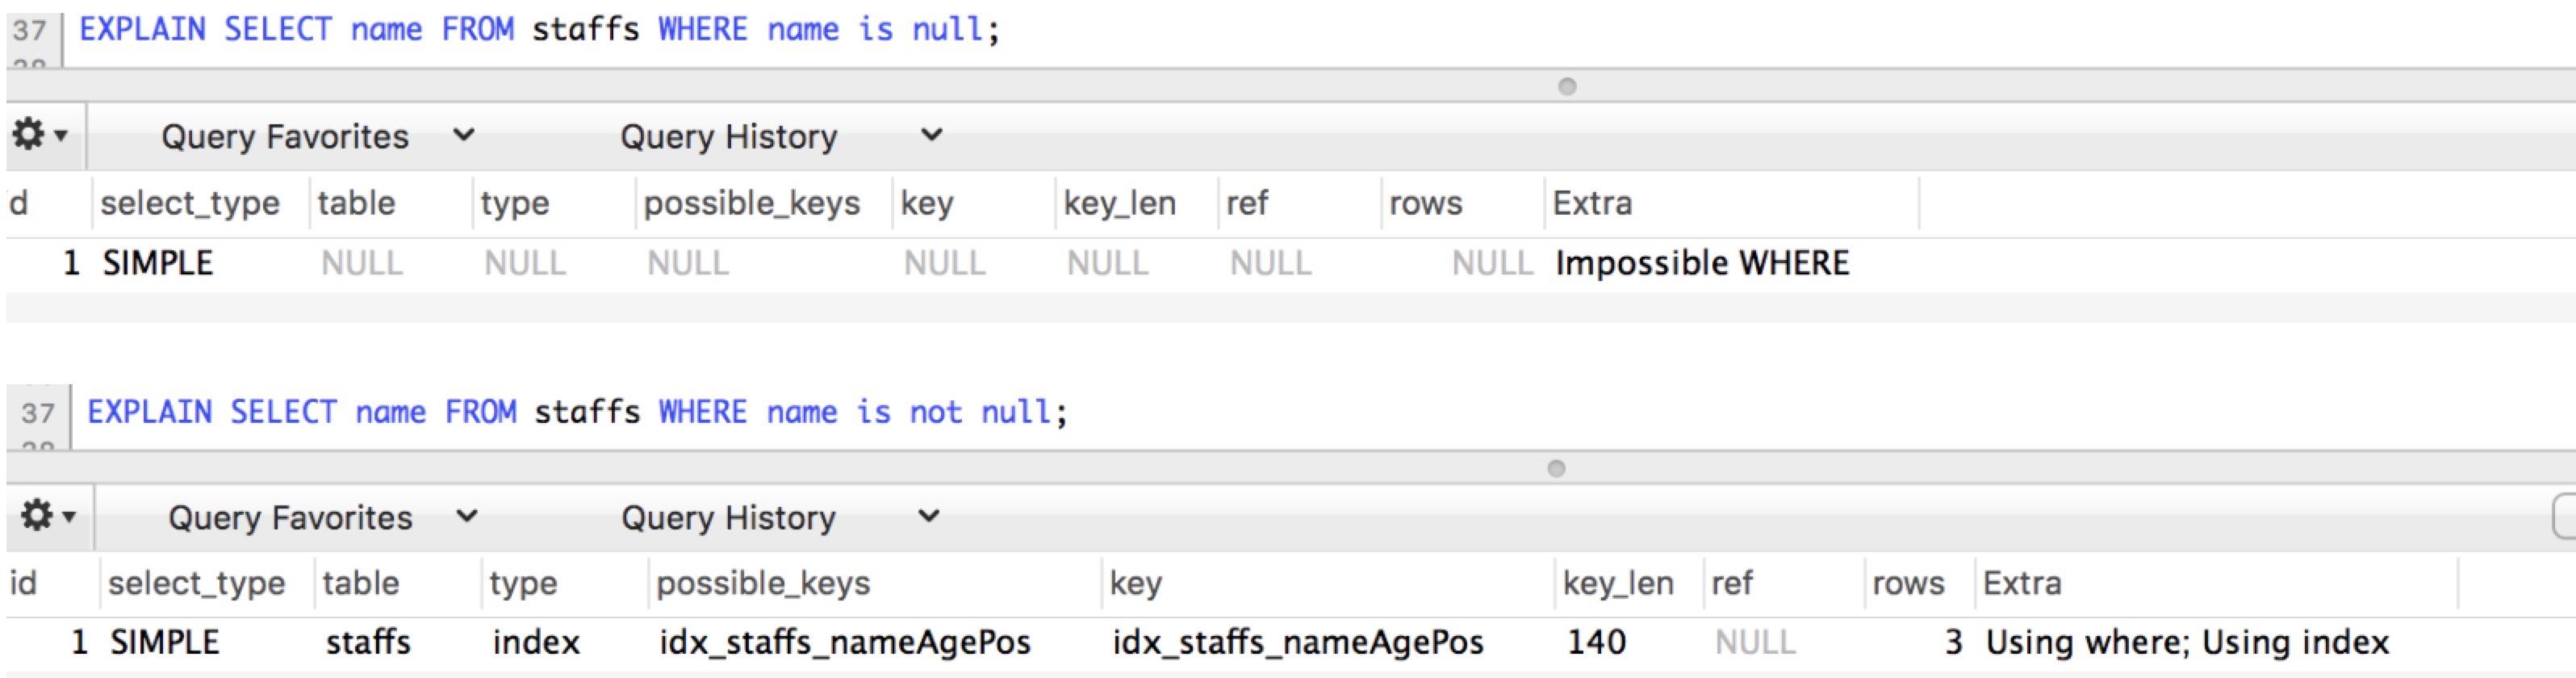 mysql-index-optimization-04-07